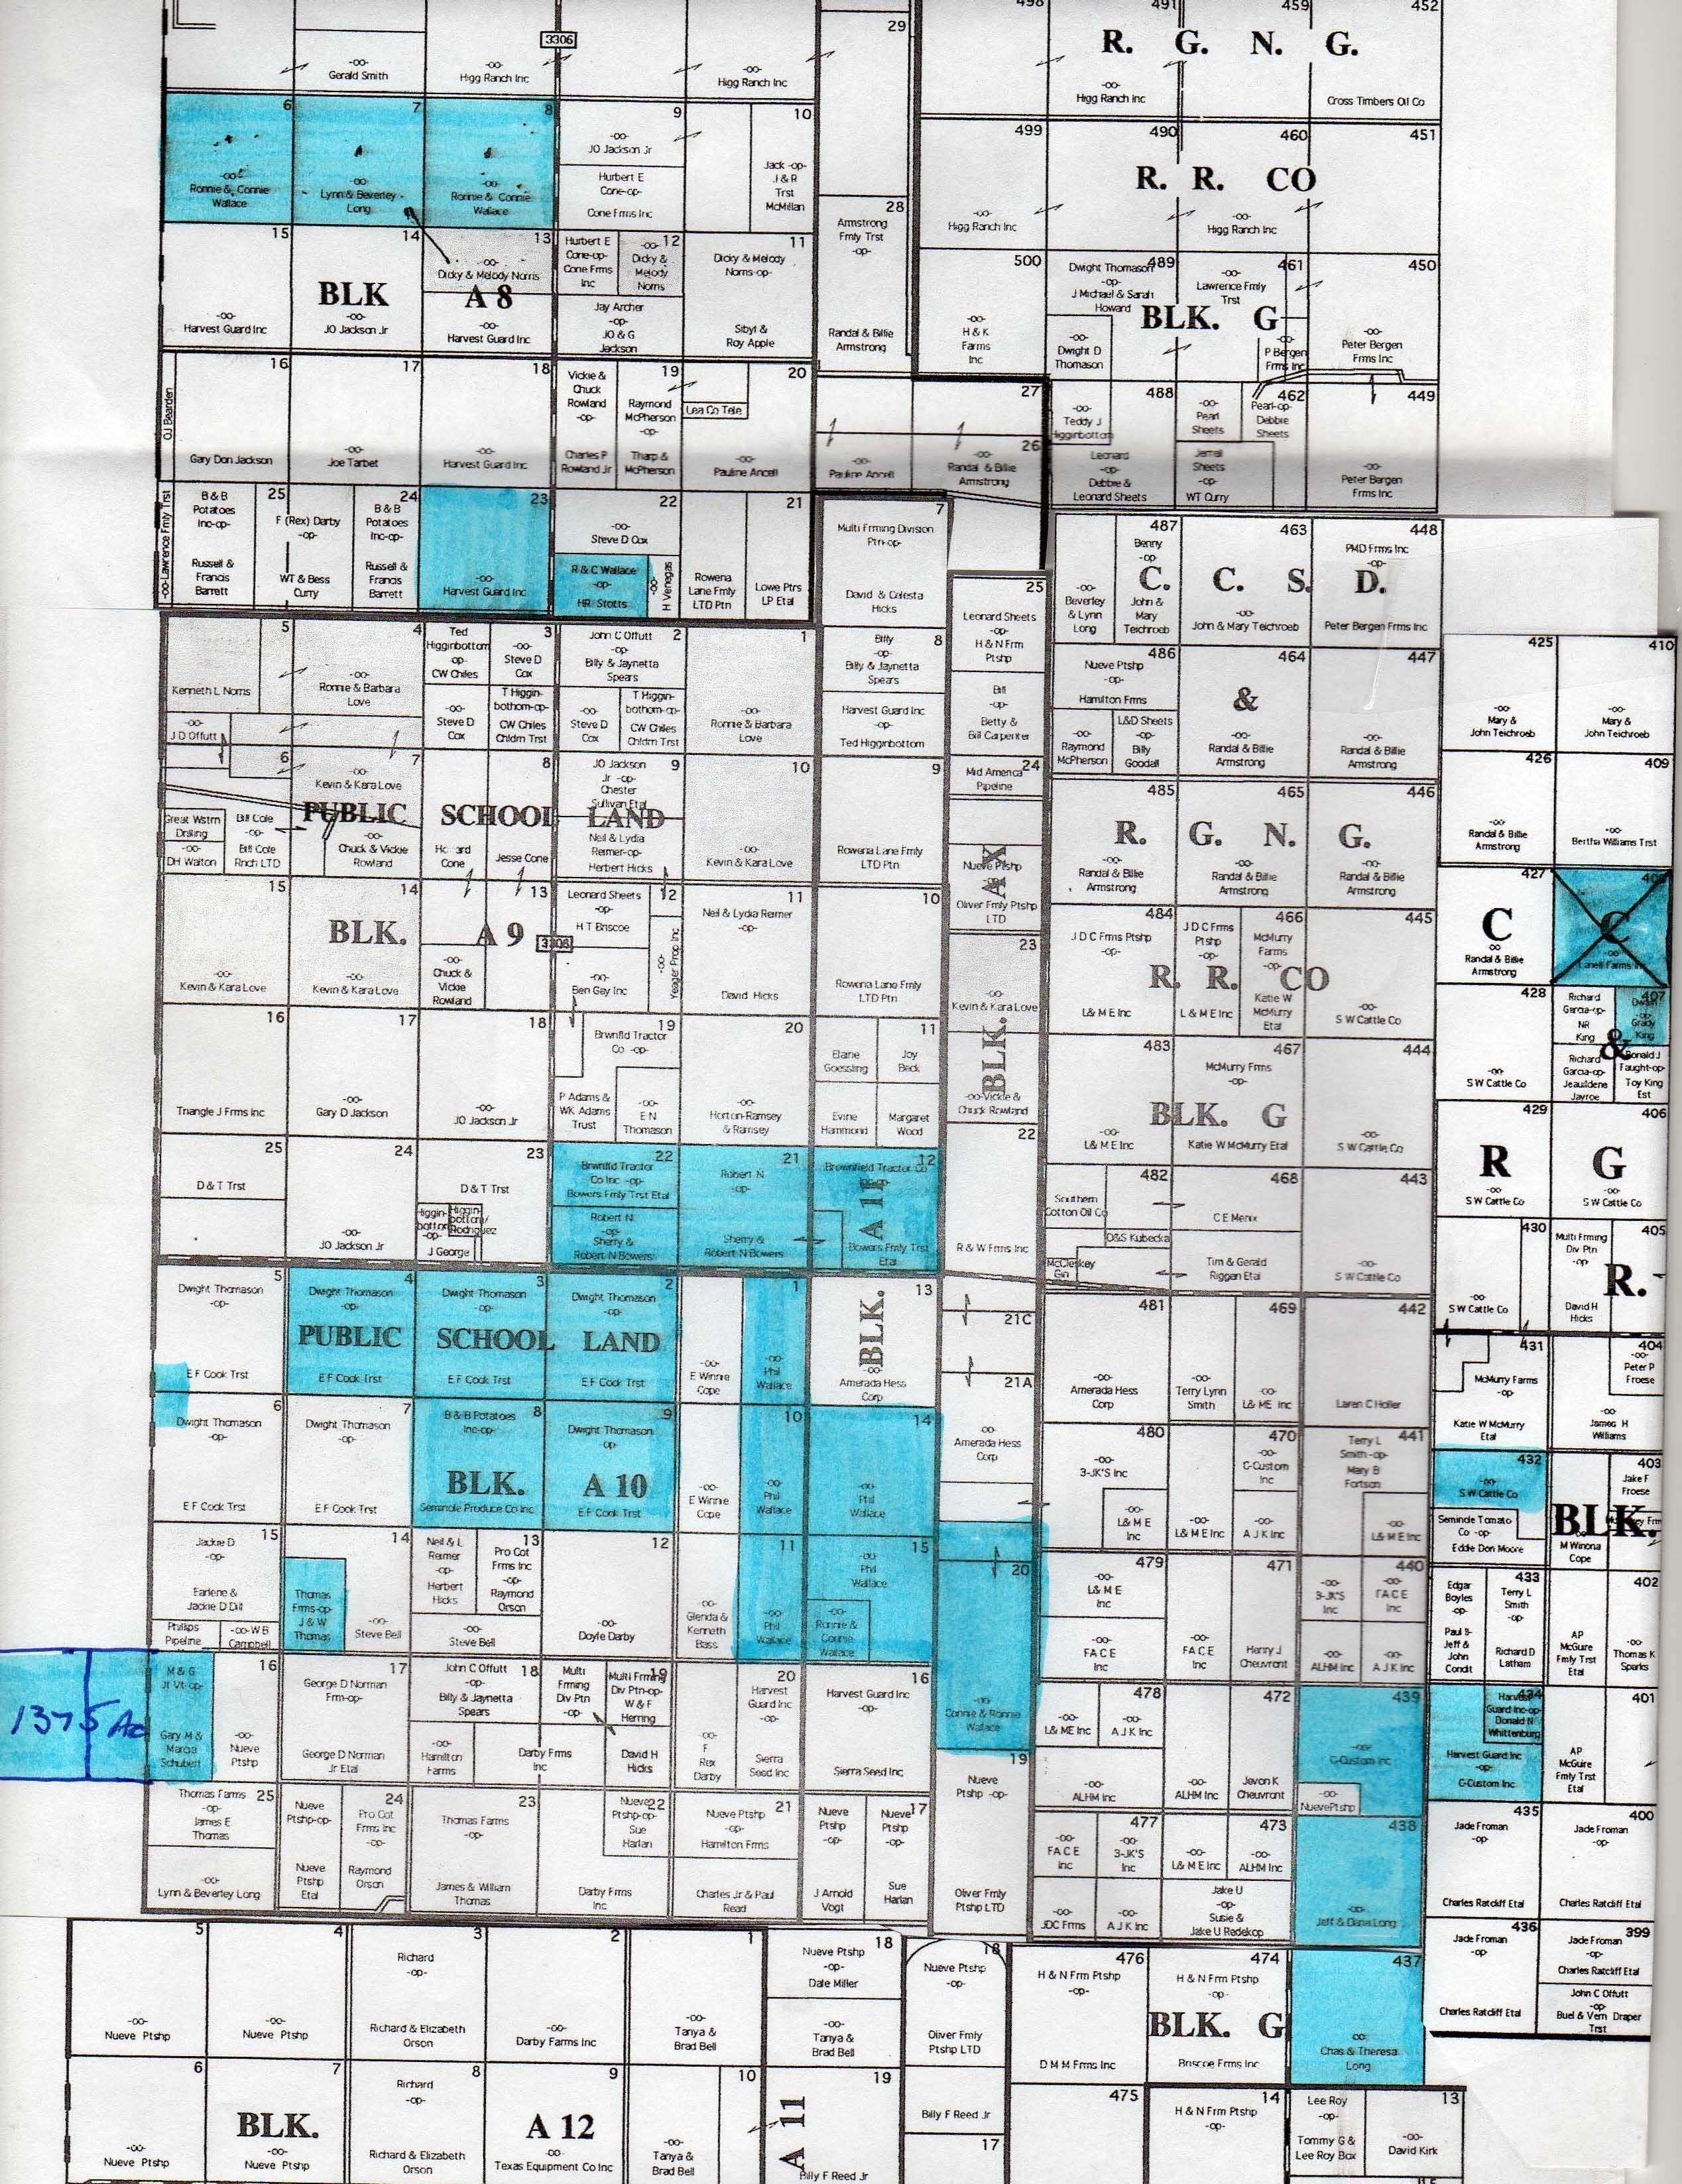 11000 Acres In Gaines County, Texas - Yoakum County Texas Map